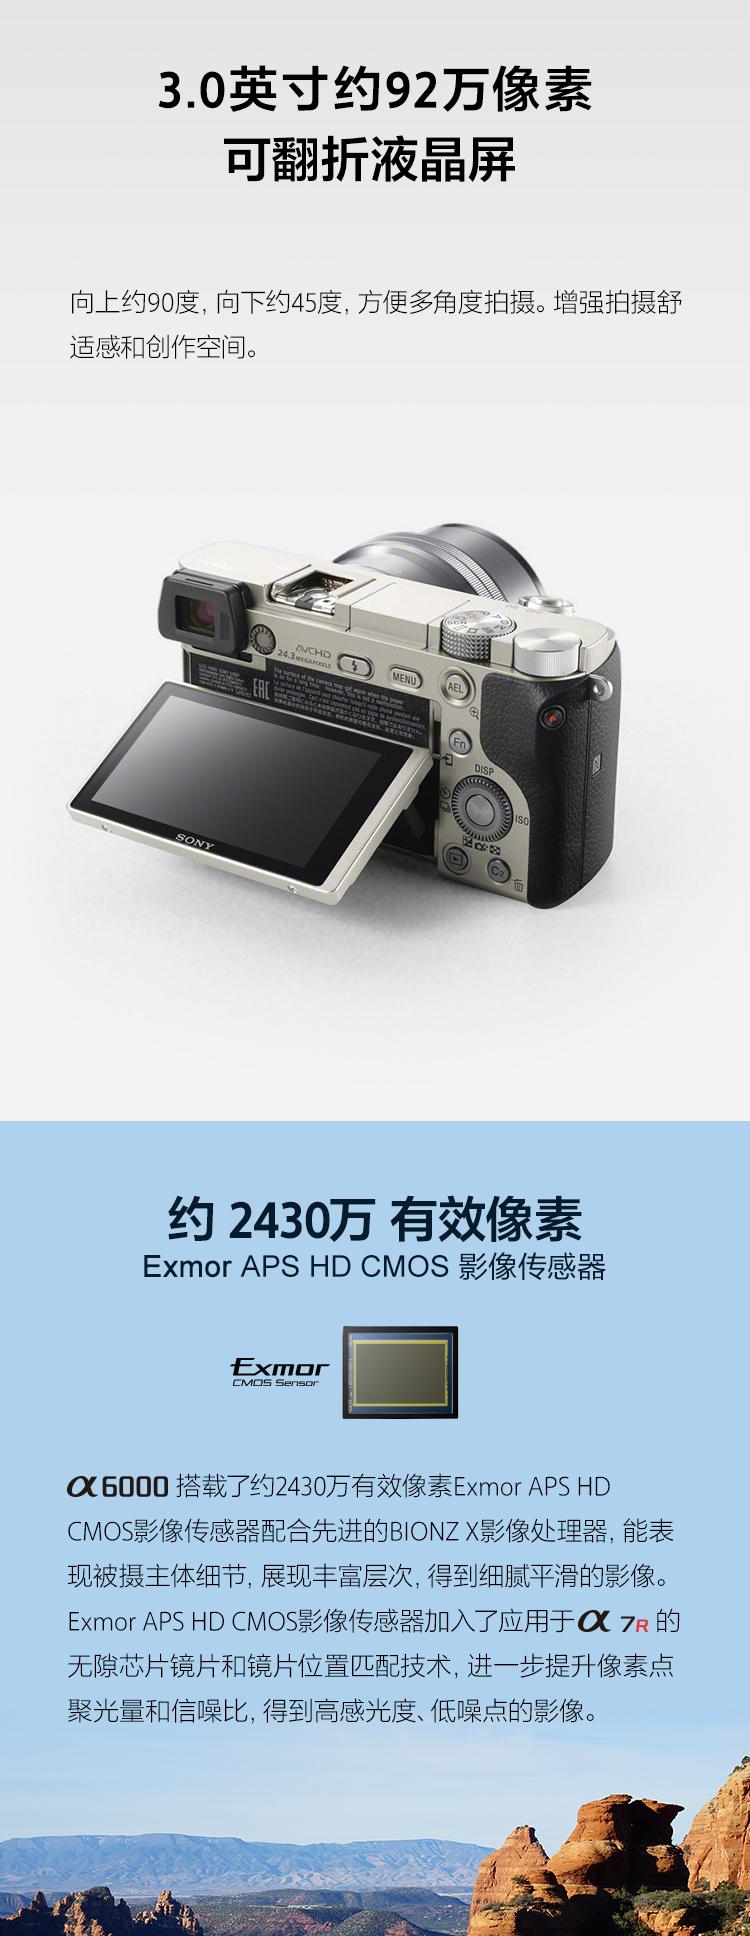 *Sony Alpha 6000 digital micro entry SLR camera a 60000l a 60000